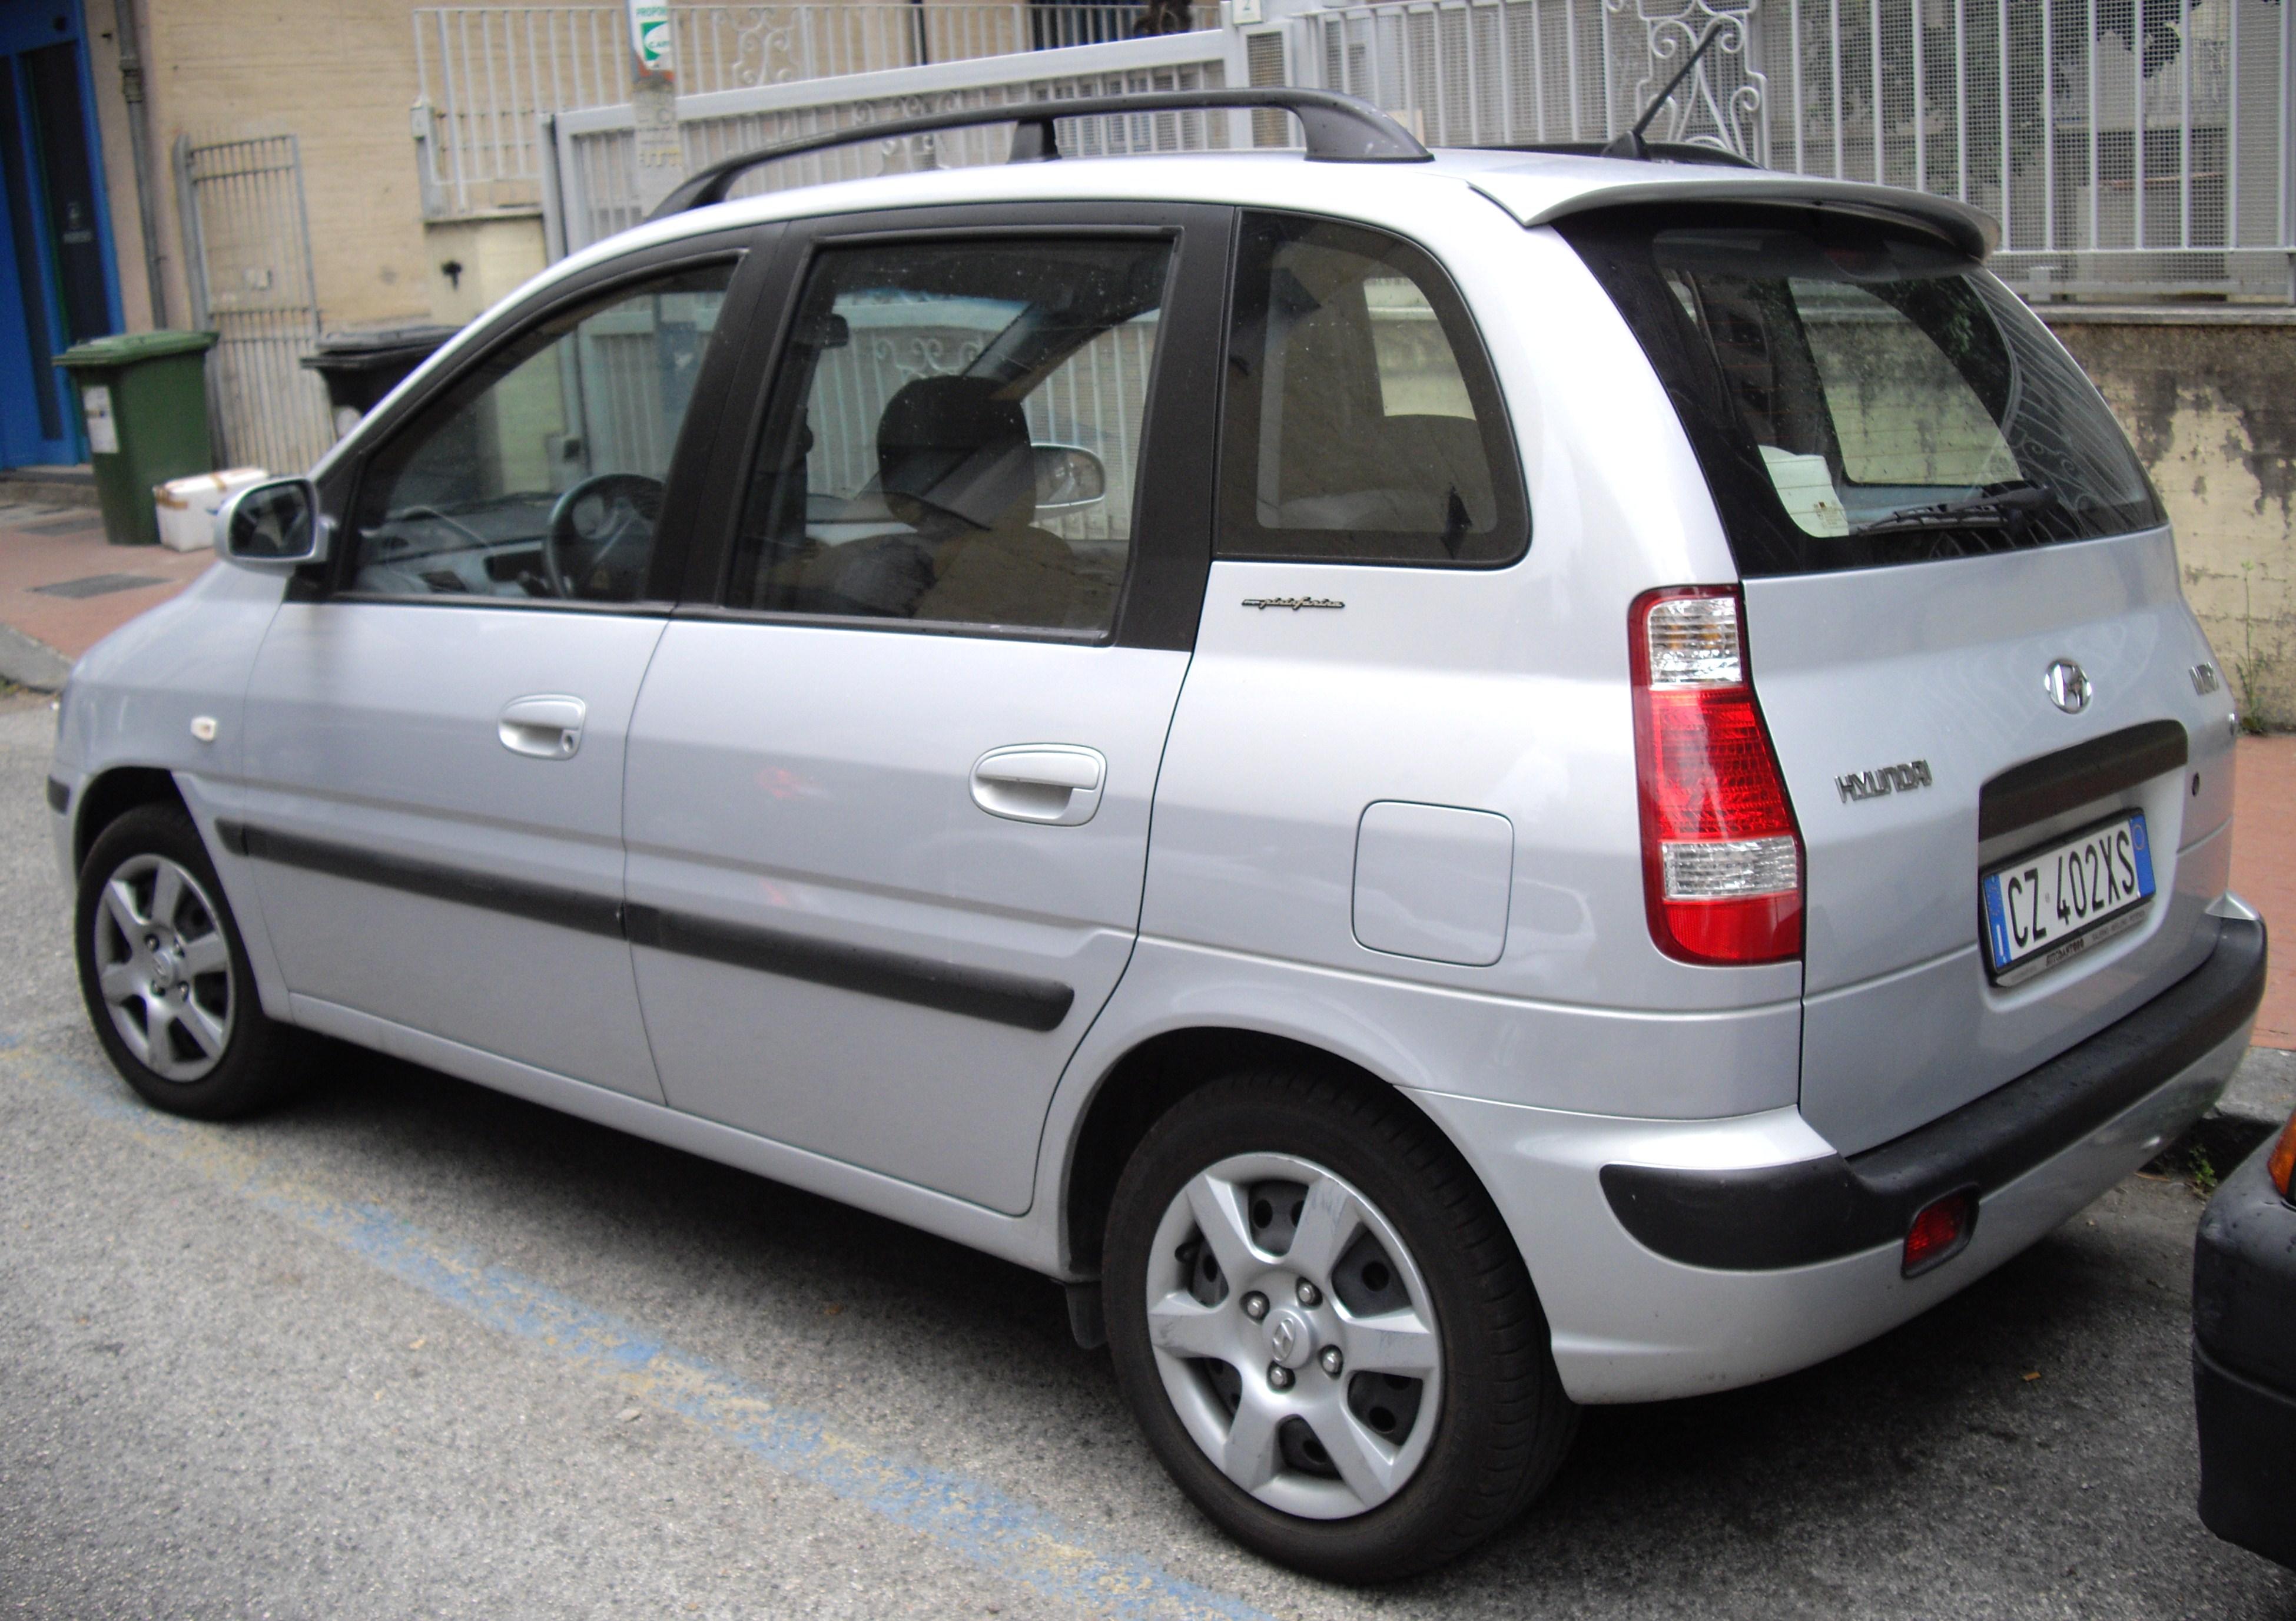 Hyundai Matrix image #6